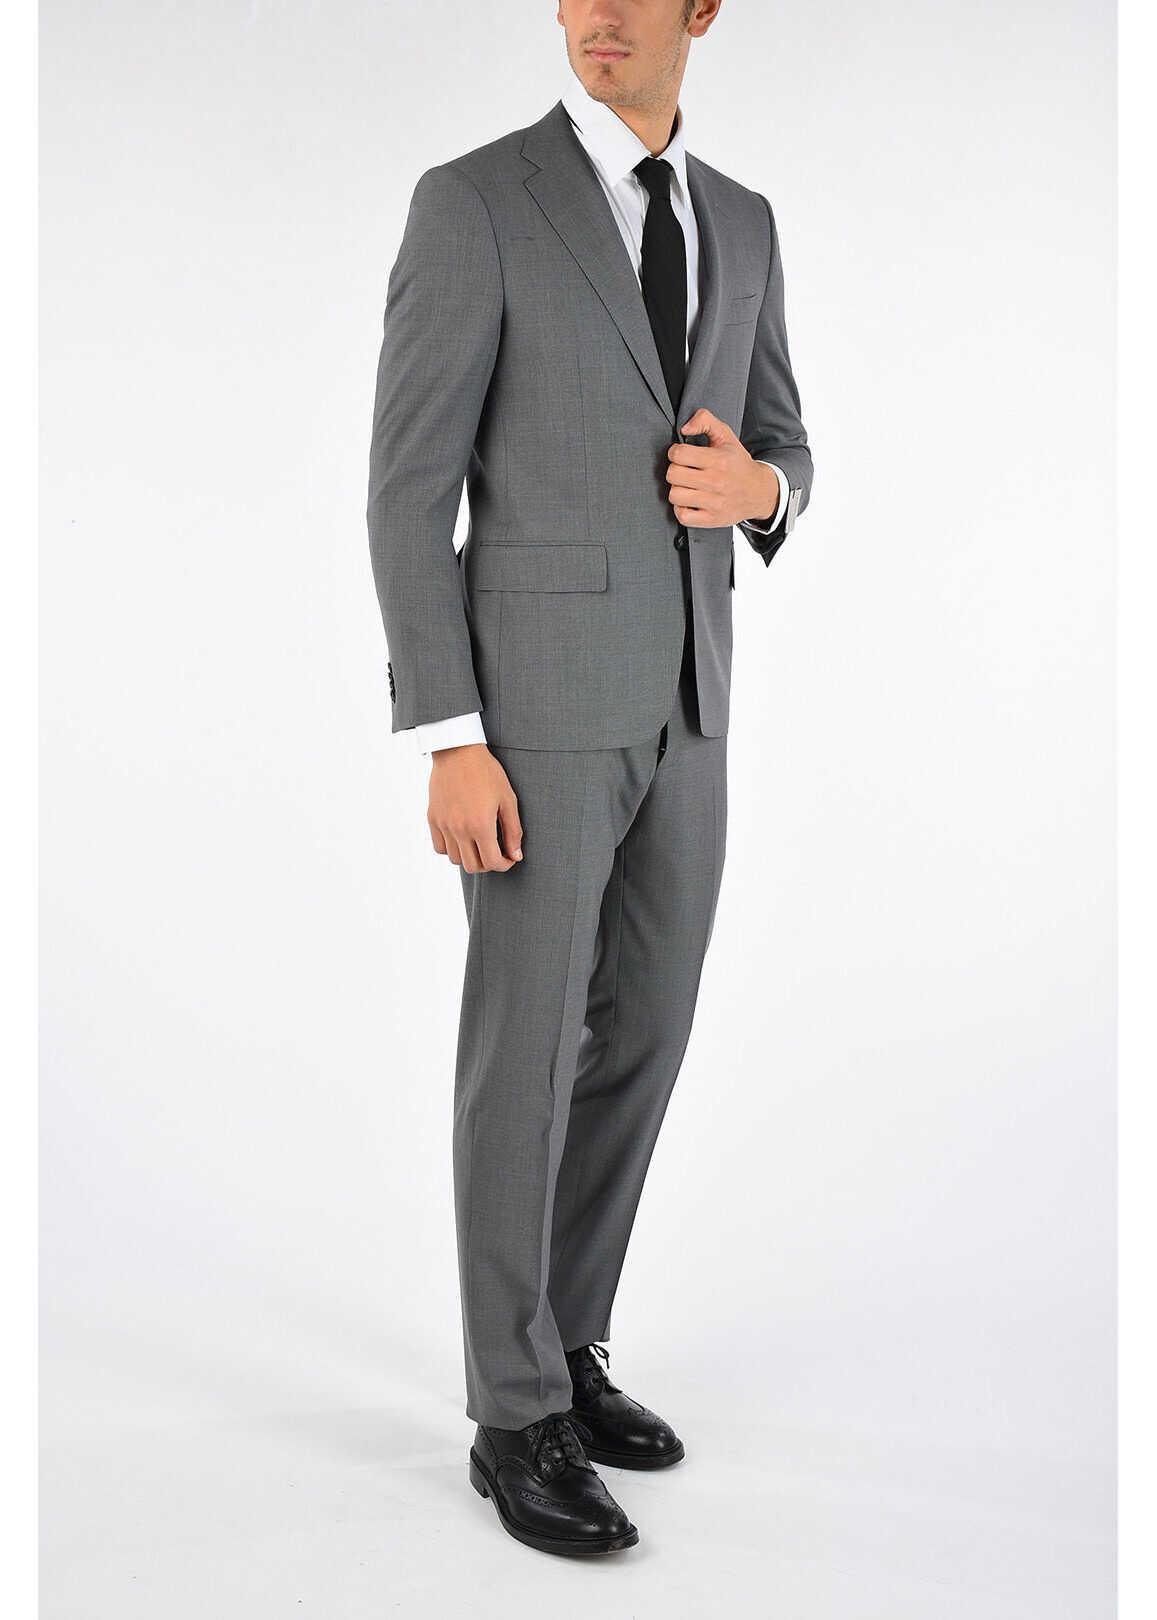 CORNELIANI Virgin Wool MANTUA 2 Button Suit GRAY imagine